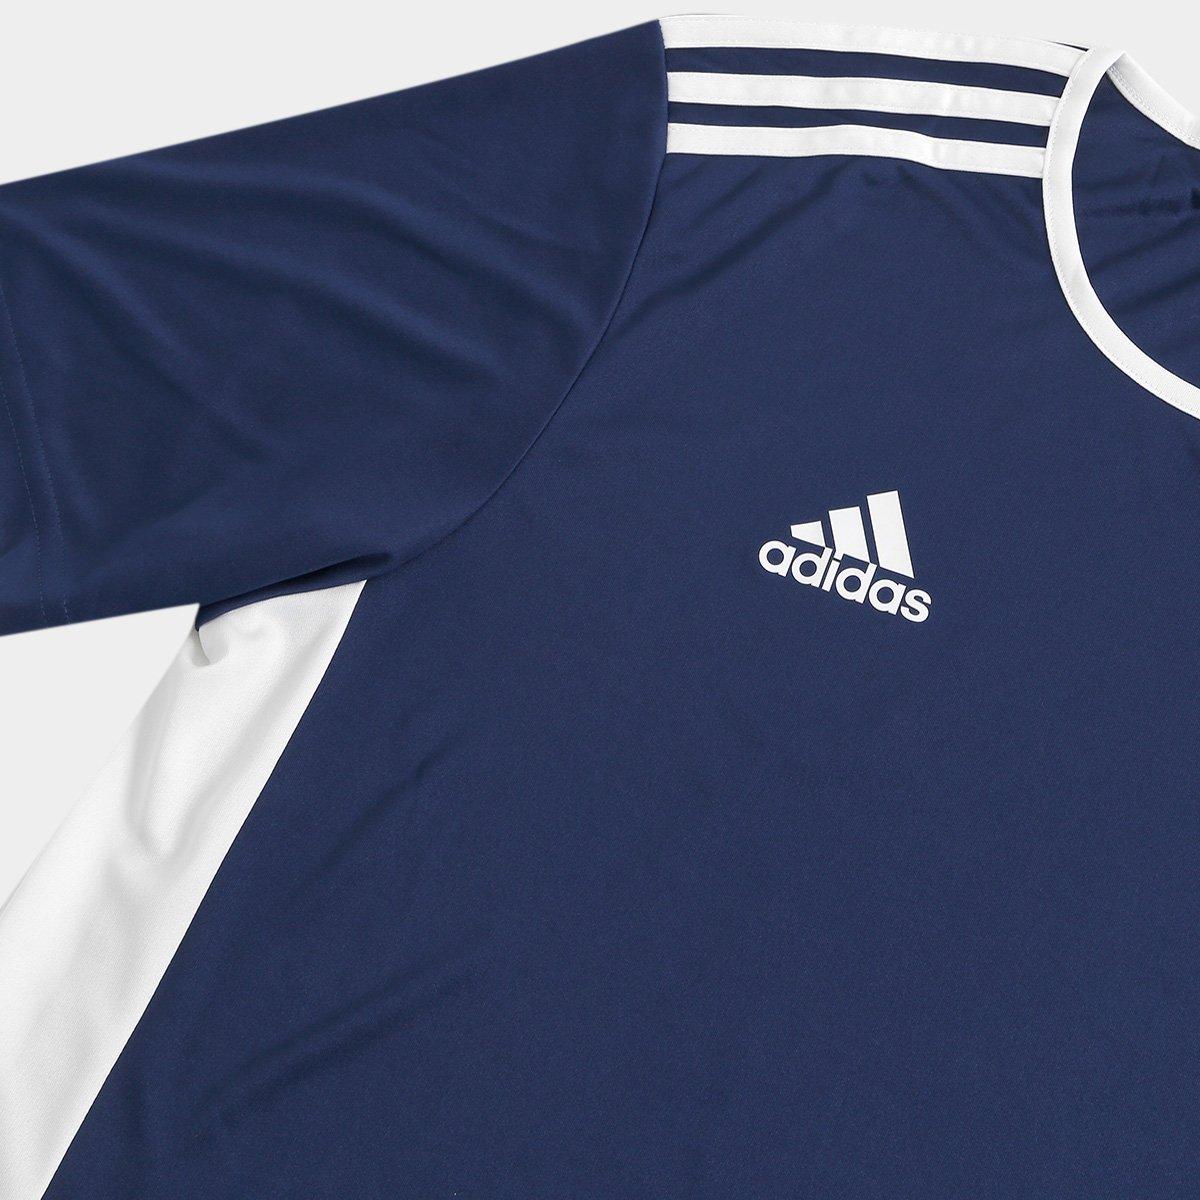 Camiseta Adidas Entrada 18 Masculina - Tam: P - 3